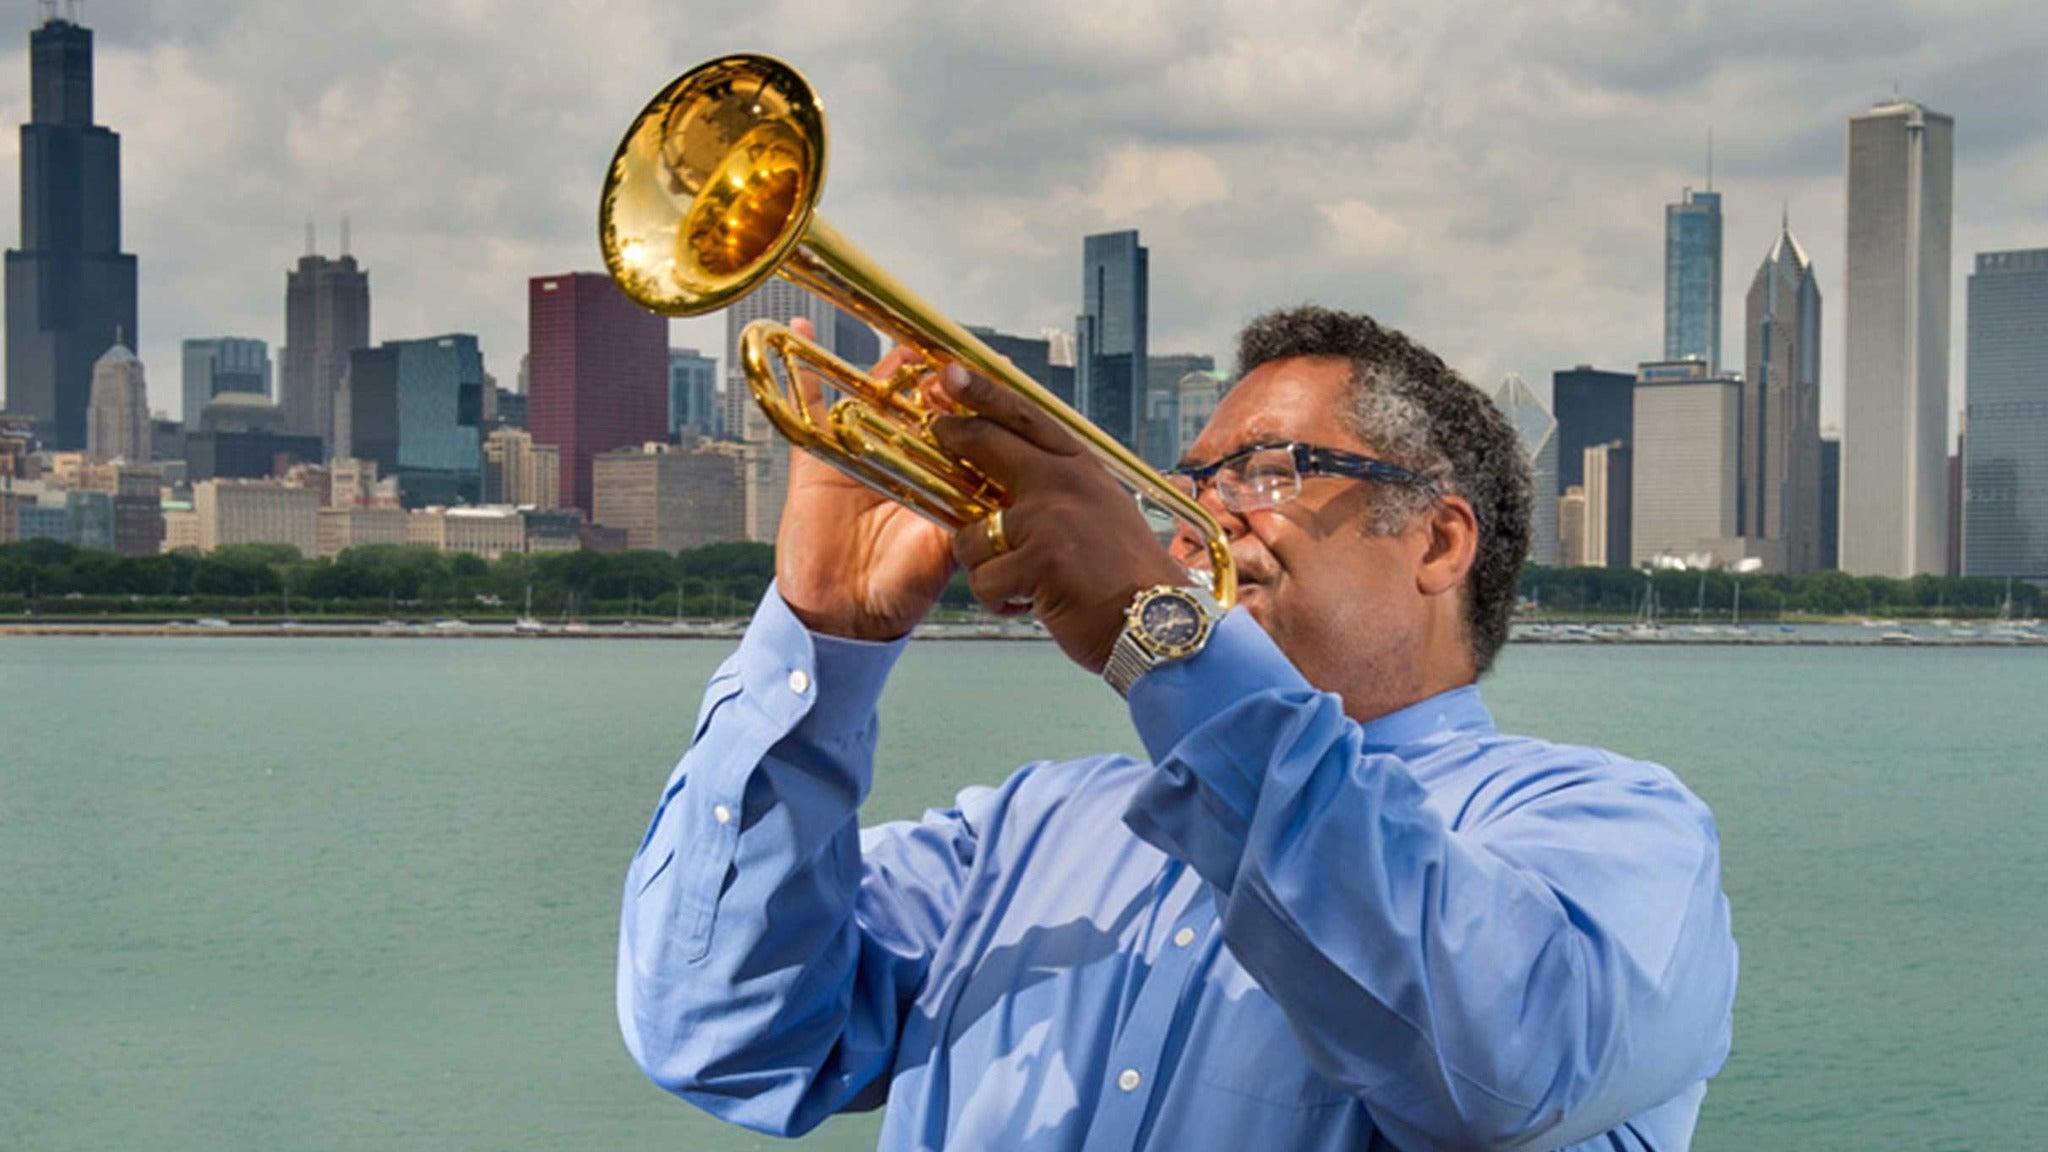 Gold Coast Jazz: Jon Faddis Quartet - Ft Lauderdale, FL 33312